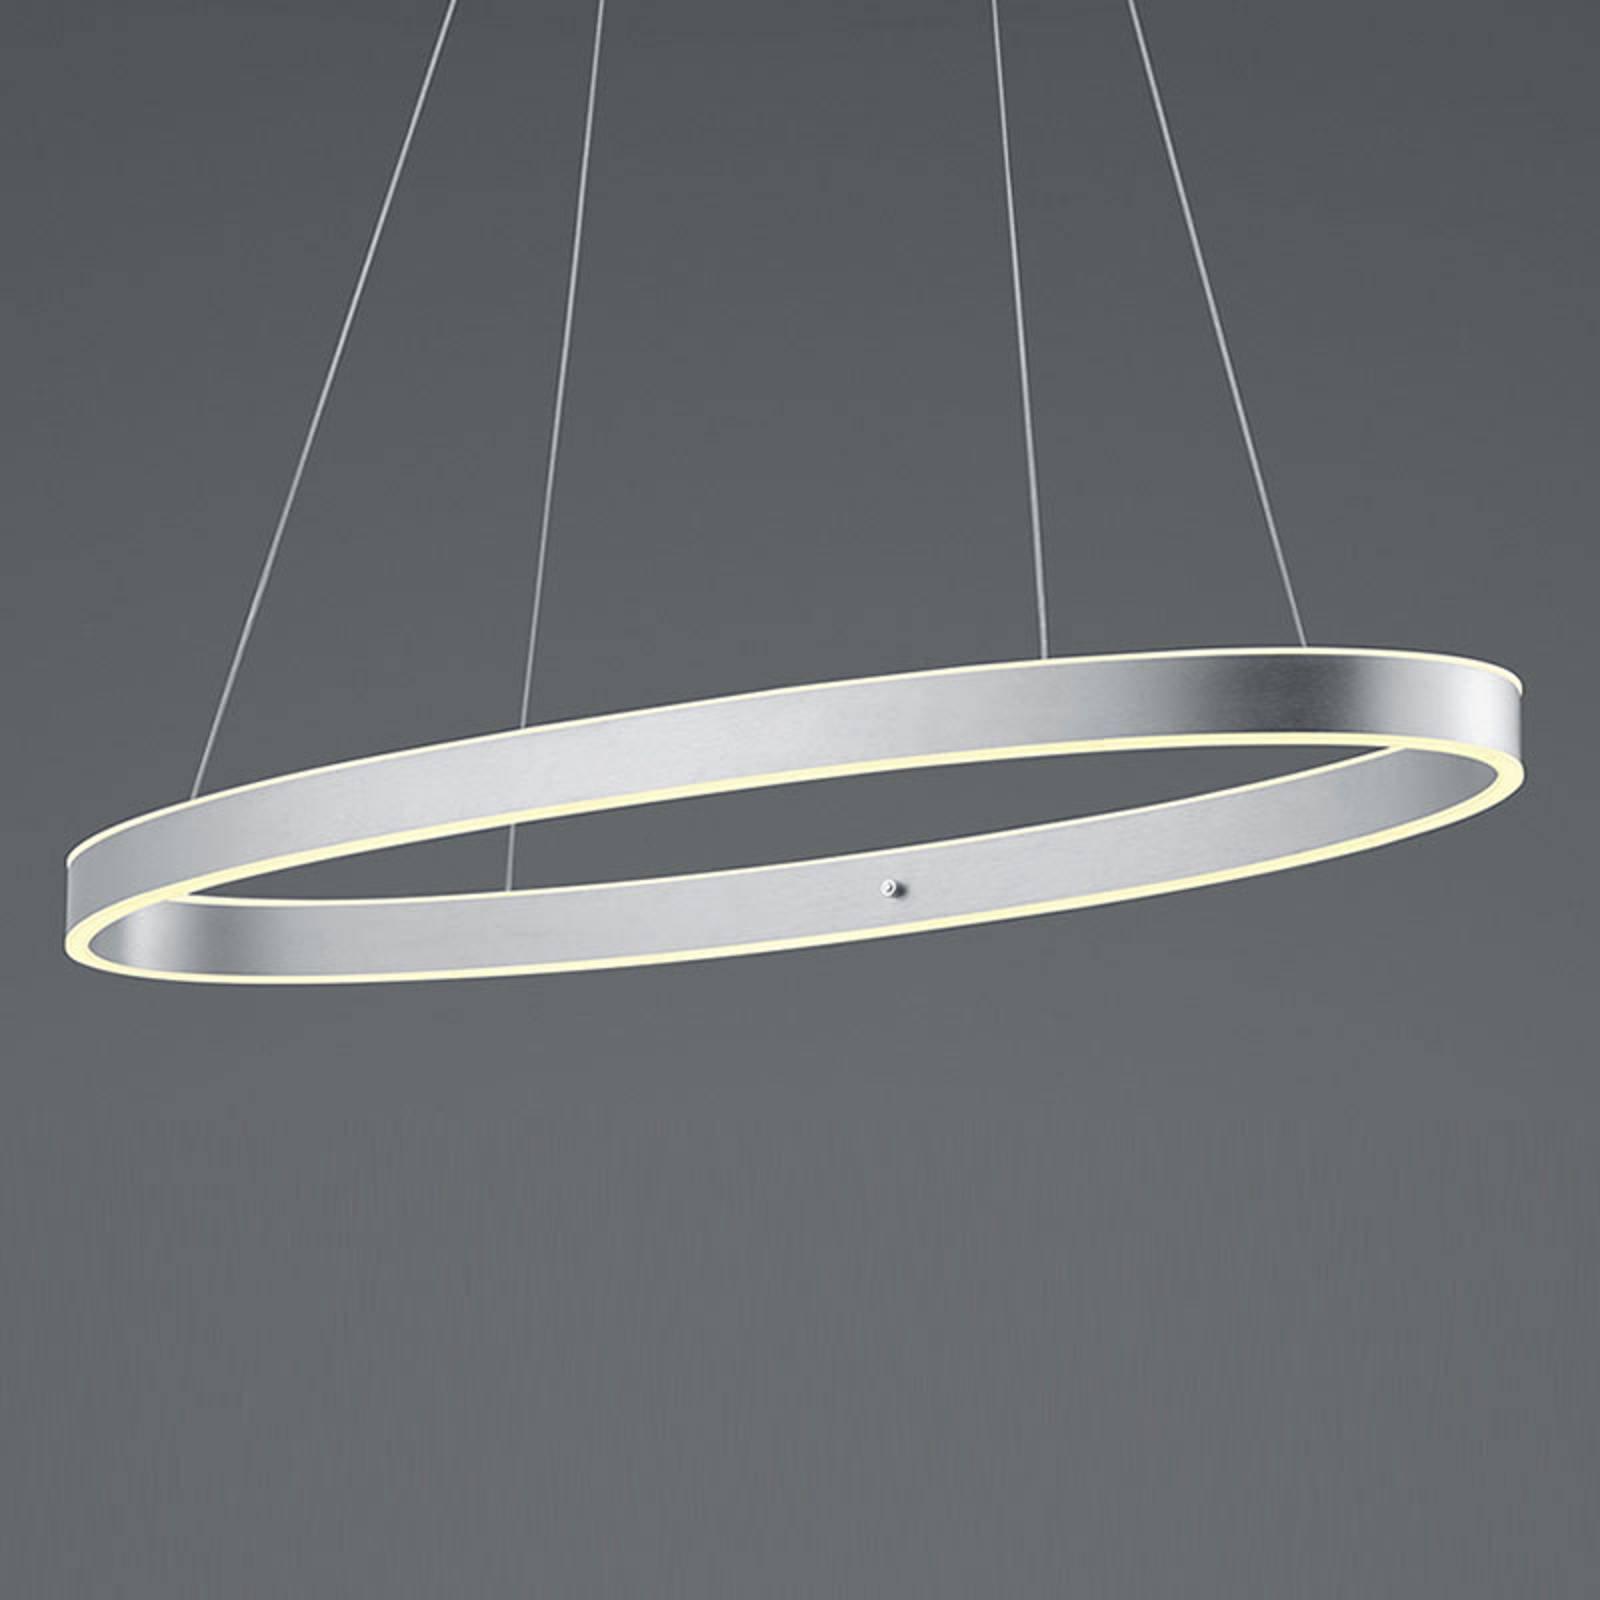 B-Leuchten Delta LED-hengelampe, aluminium matt